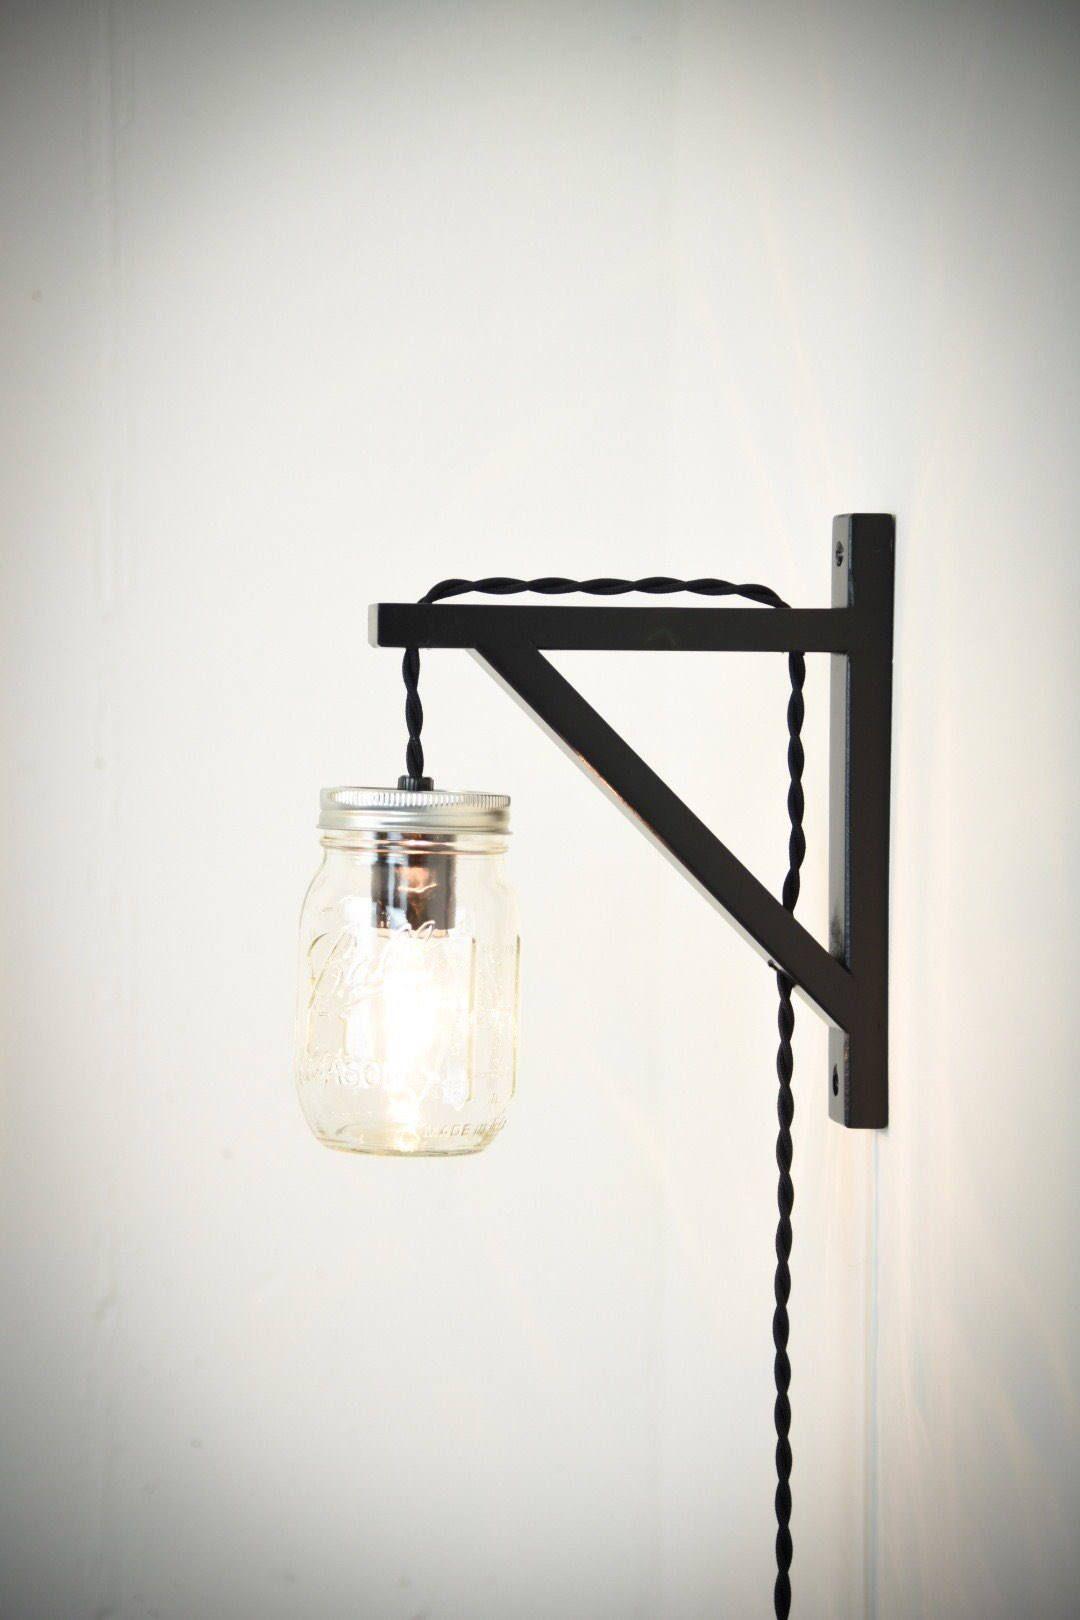 Mason Jar Wall Sconce Plug In Wall Sconce Wall Light Black Wall Lamp Plug In Light Rustic Mason Jar Wall Sconce Black Wall Lamps Candle Wall Sconces